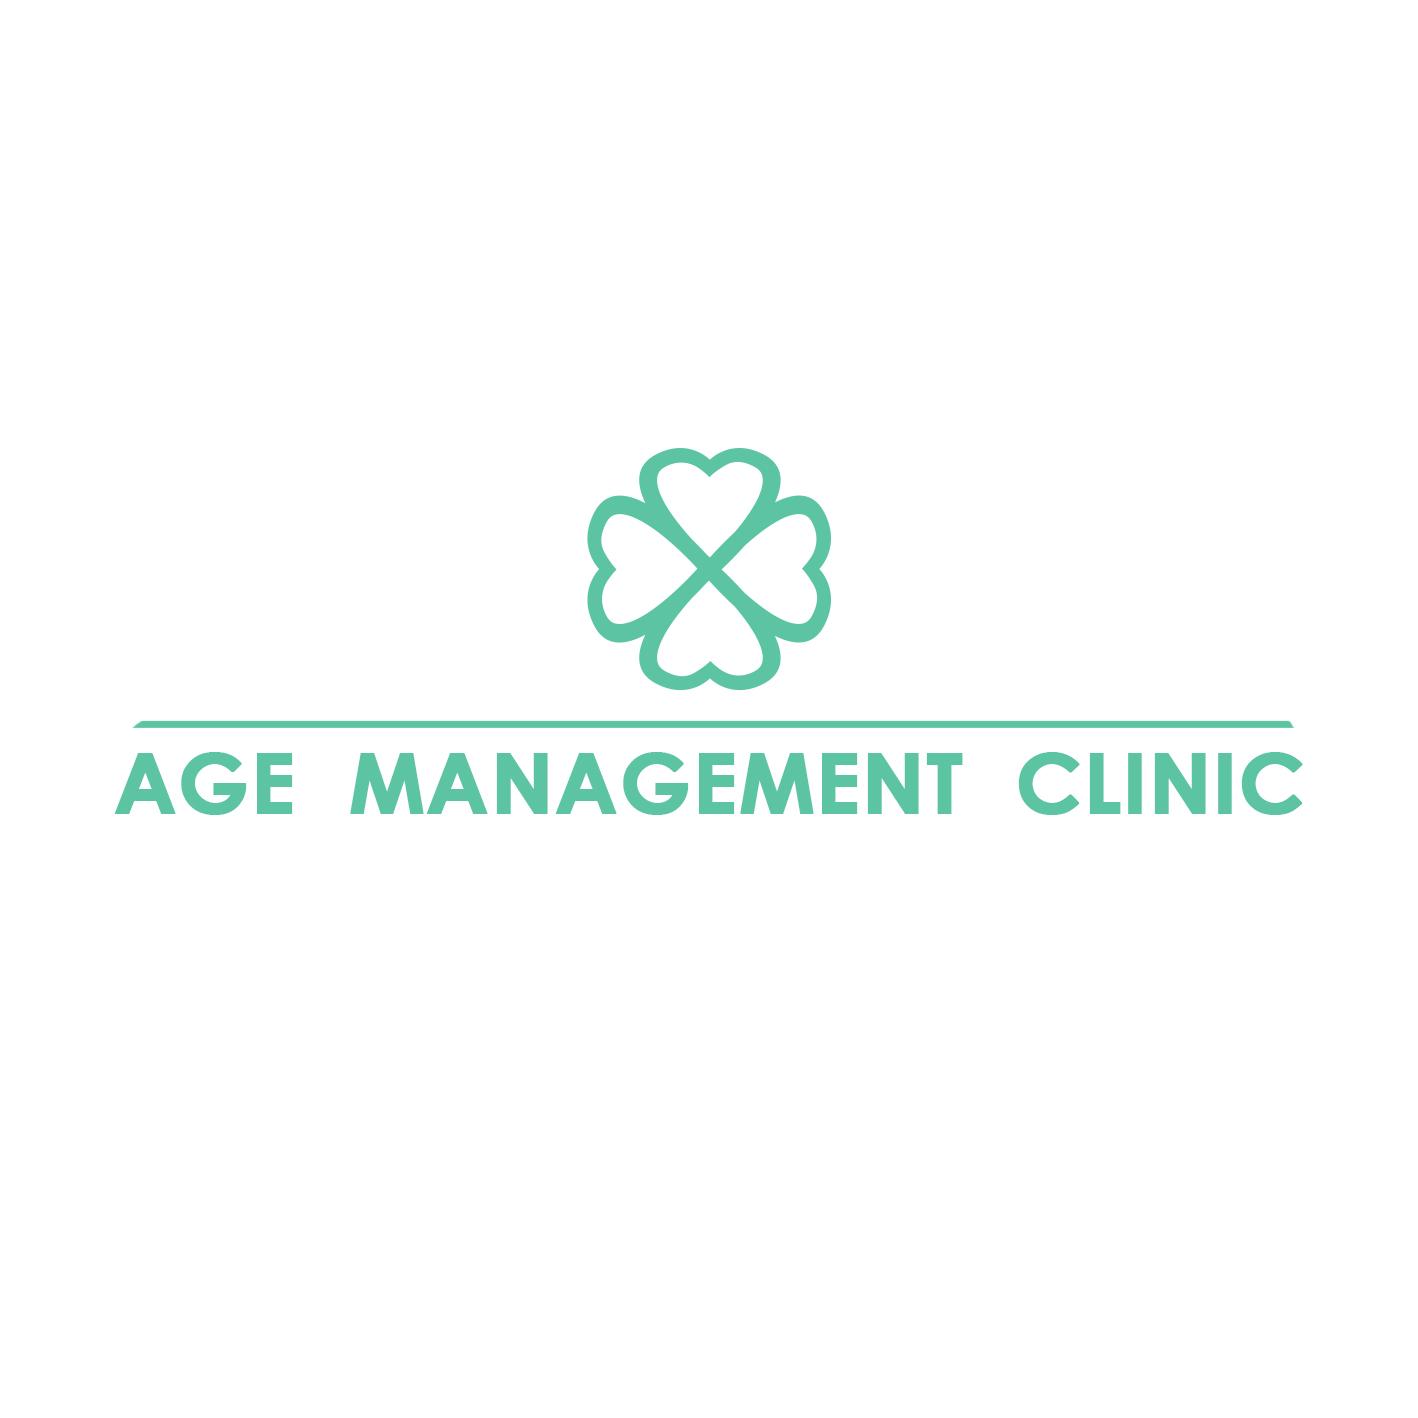 Логотип для медицинского центра (клиники)  фото f_1005b9a639a6e4df.jpg